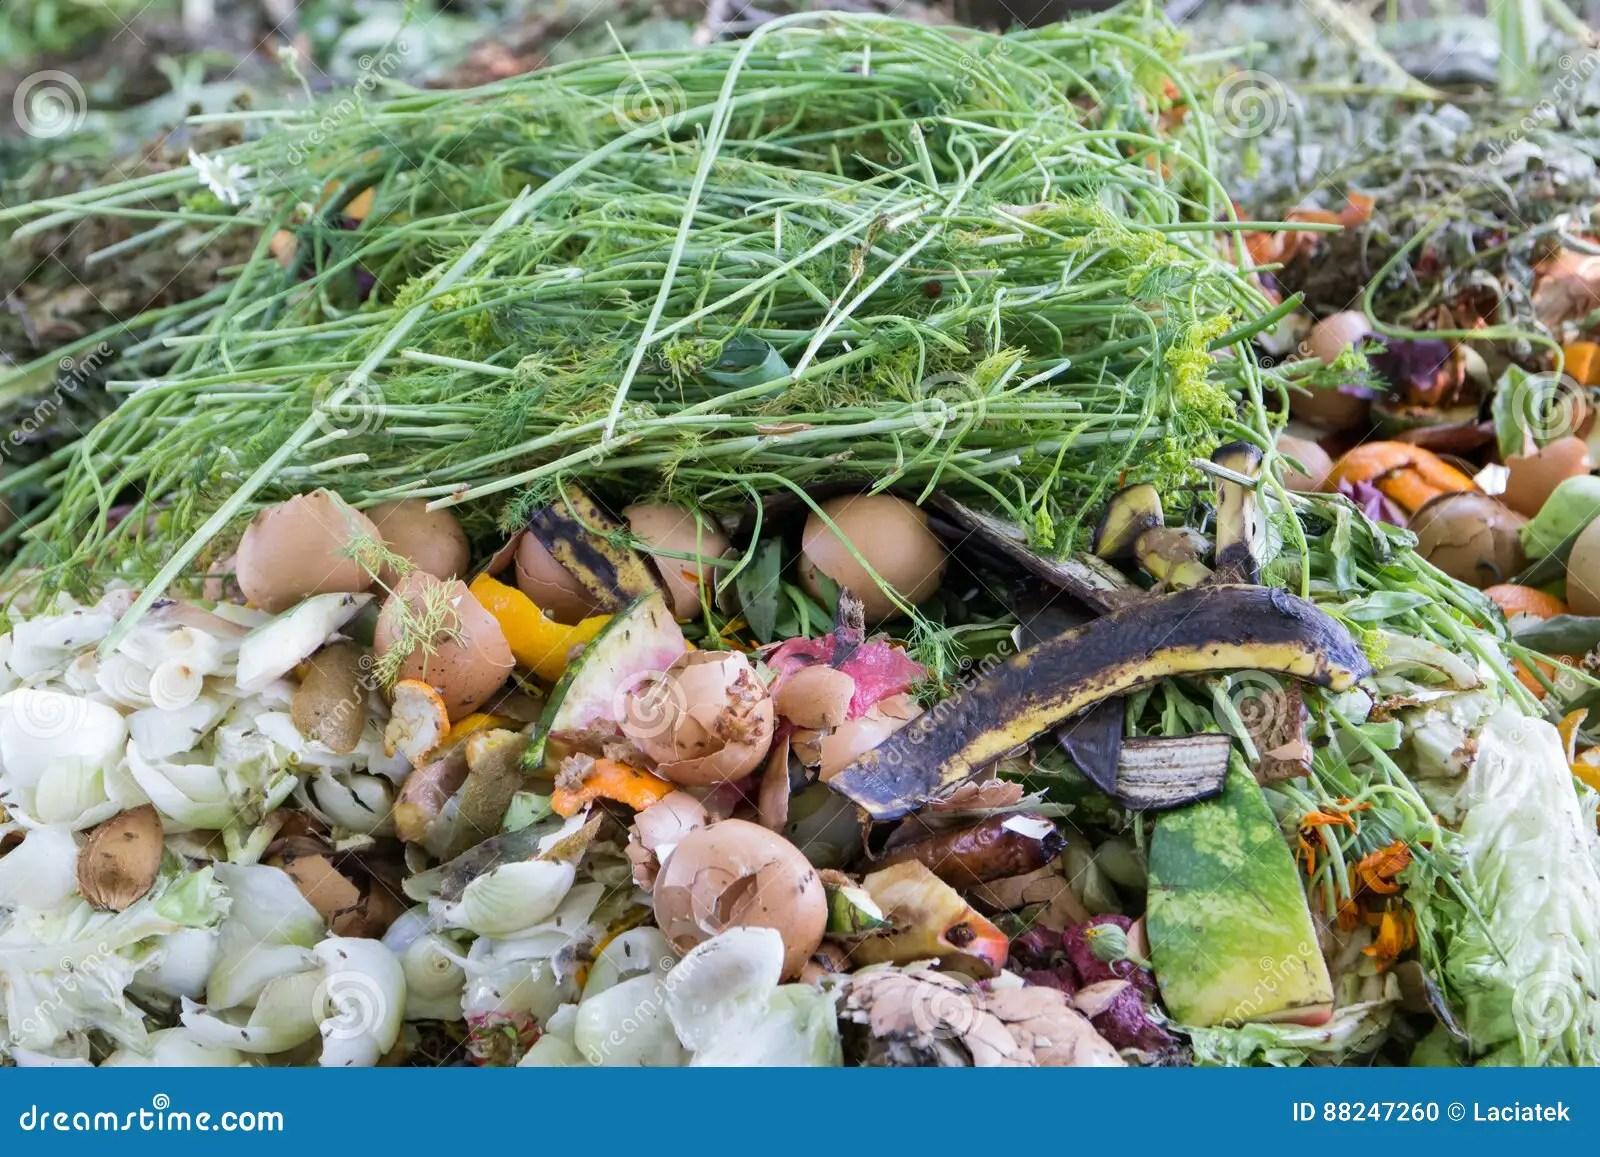 kitchen composter diy countertops 在厨房废物的飞行 堆肥成份库存照片 图片包括有降低 回收 陆运 食物 堆肥成份